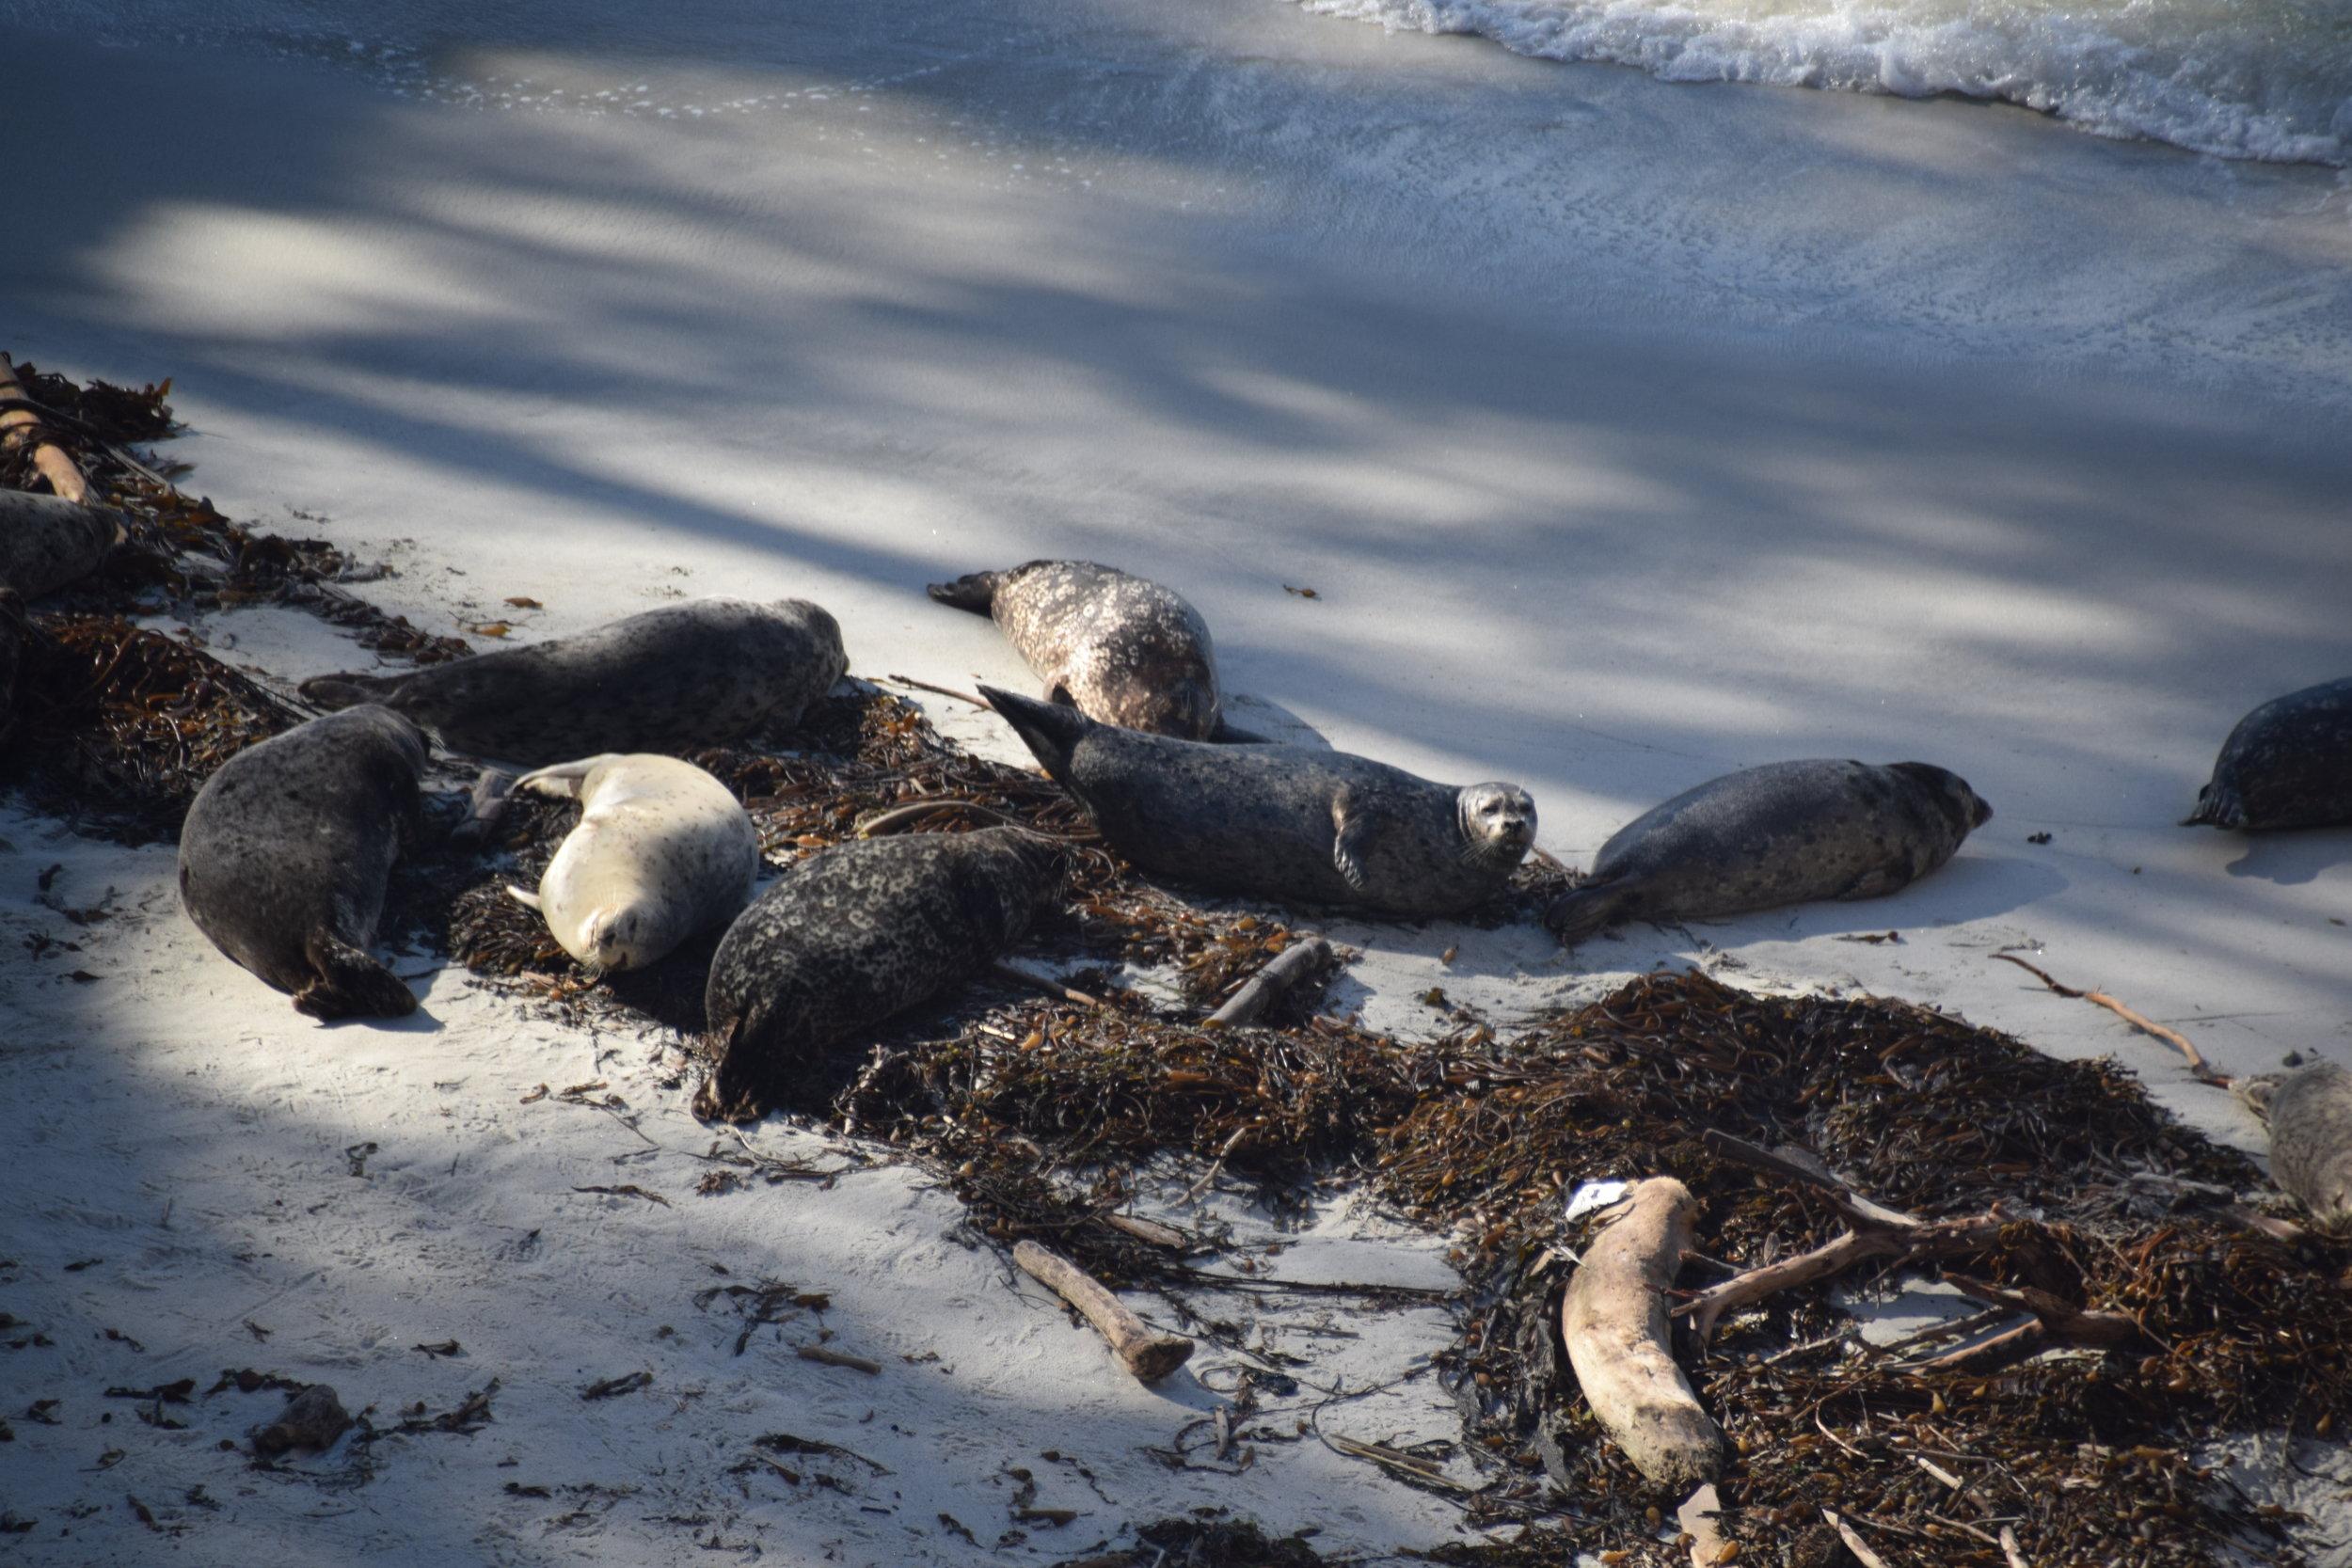 Harbor seals enjoy patchy sunlight at Point Lobos.